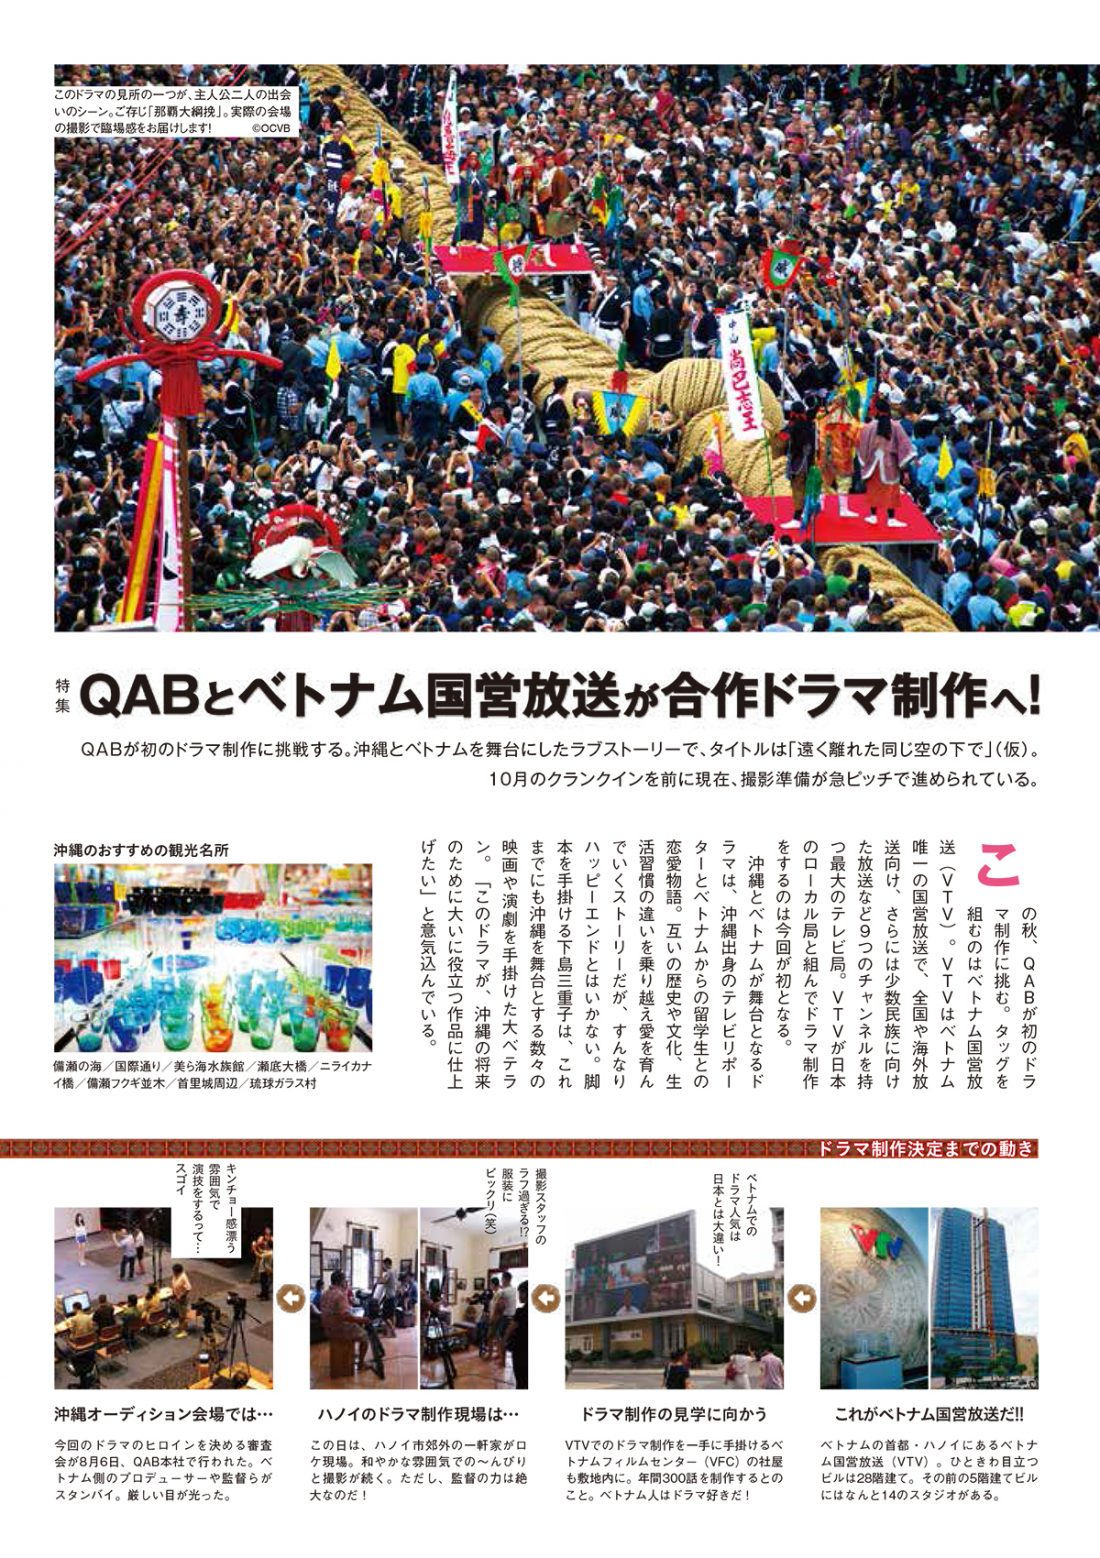 https://www.qab.co.jp/qgoro/wp-content/uploads/quun_0602-1100x1558.jpg